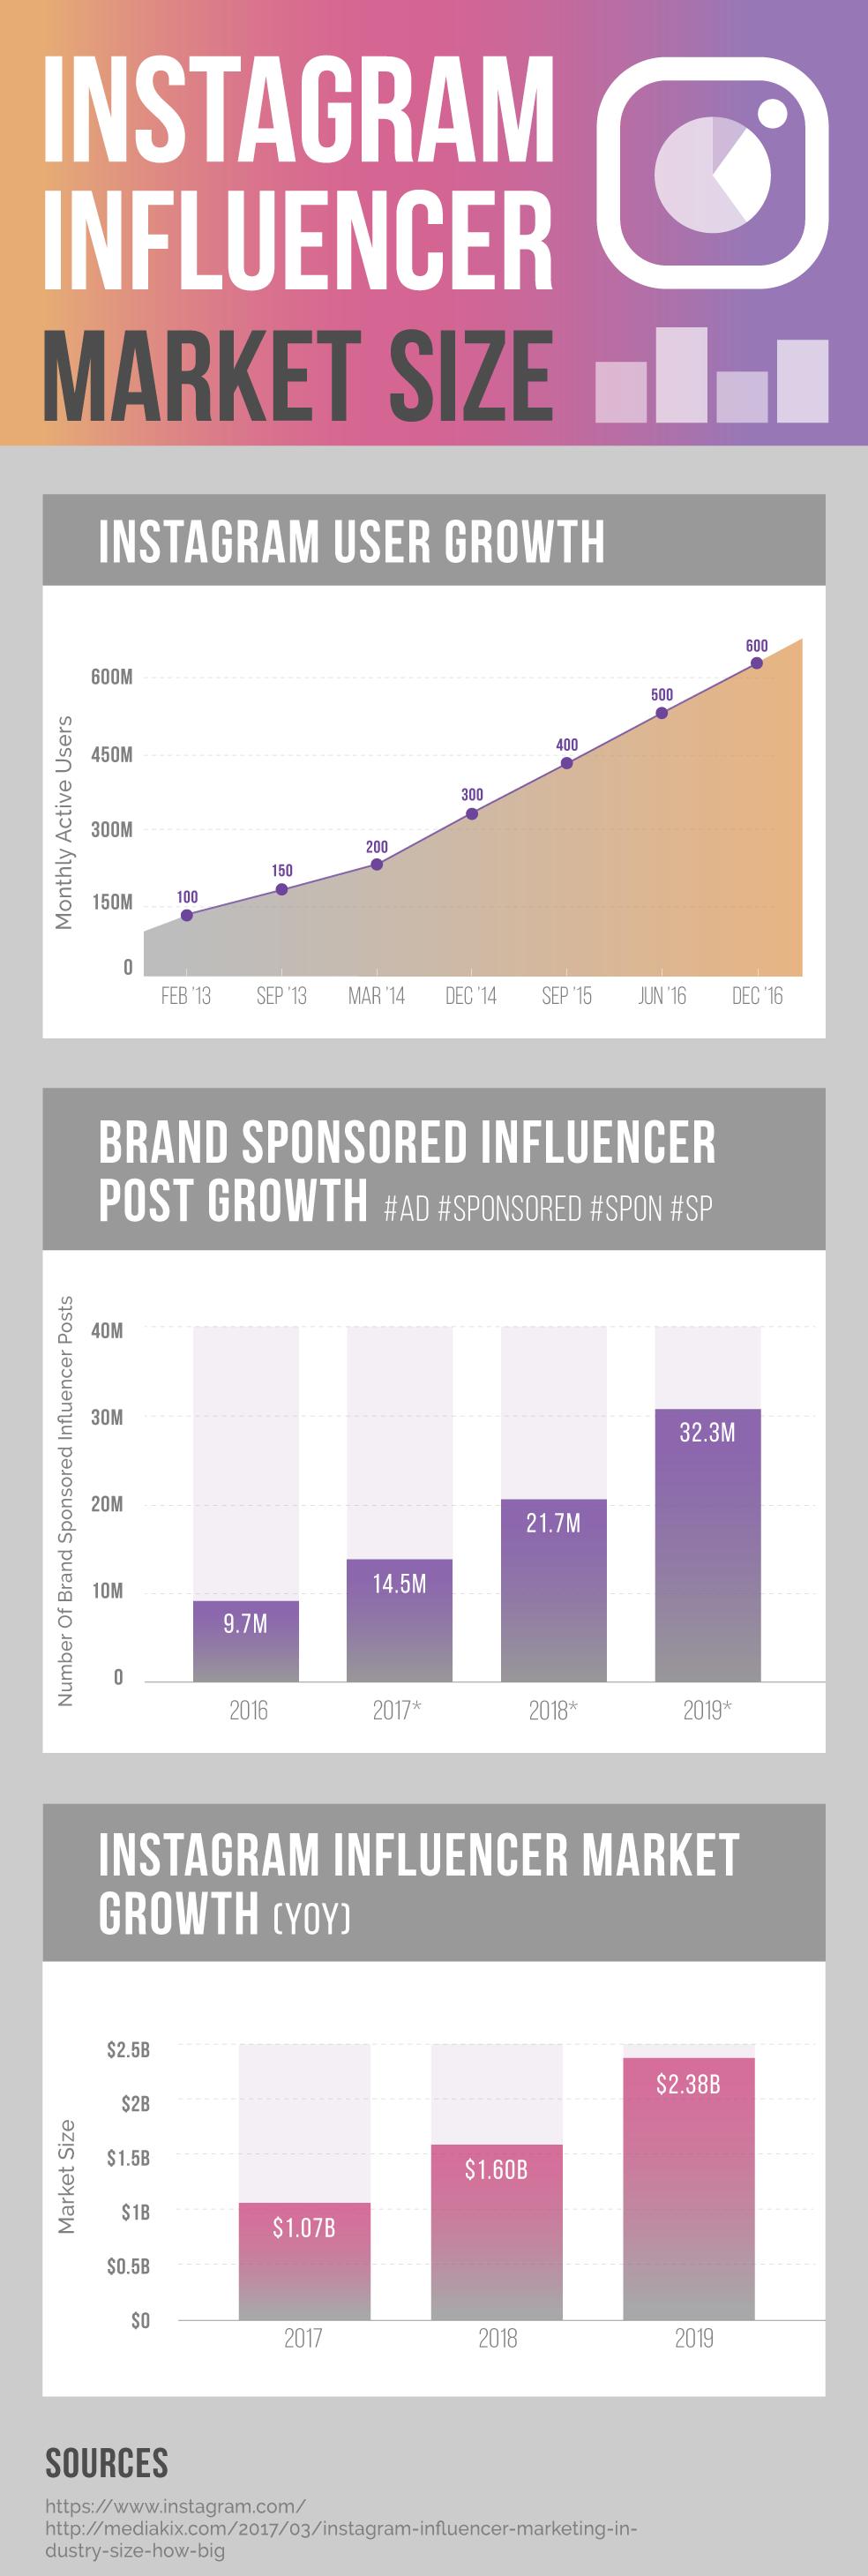 Instagram-Influencer-Marketing-Infographic-Industry-Market-Size.png